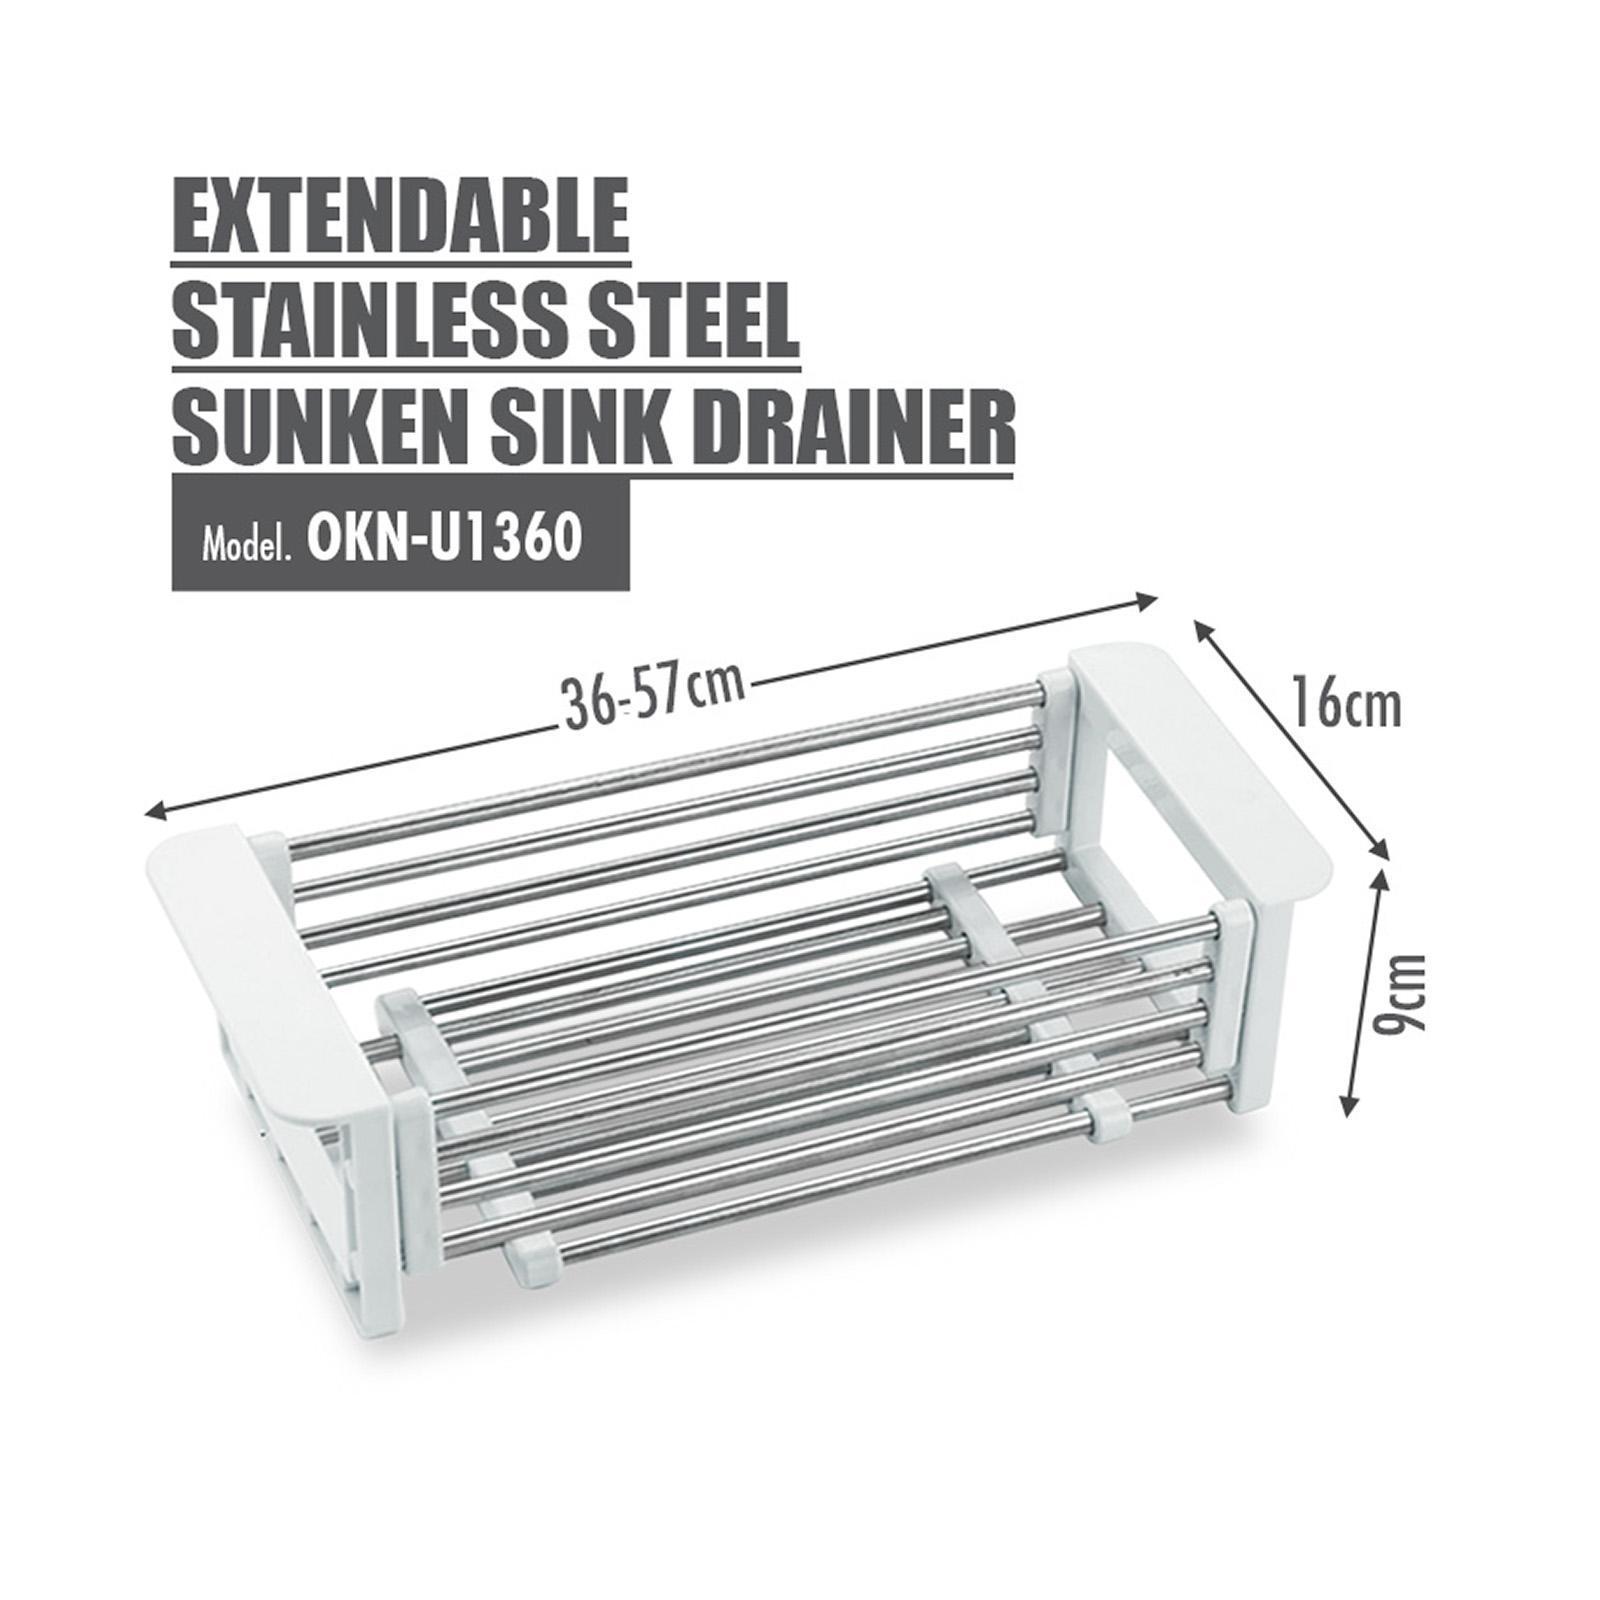 HOUZE Extendable Stainless Steel Sunken Sink Drainer